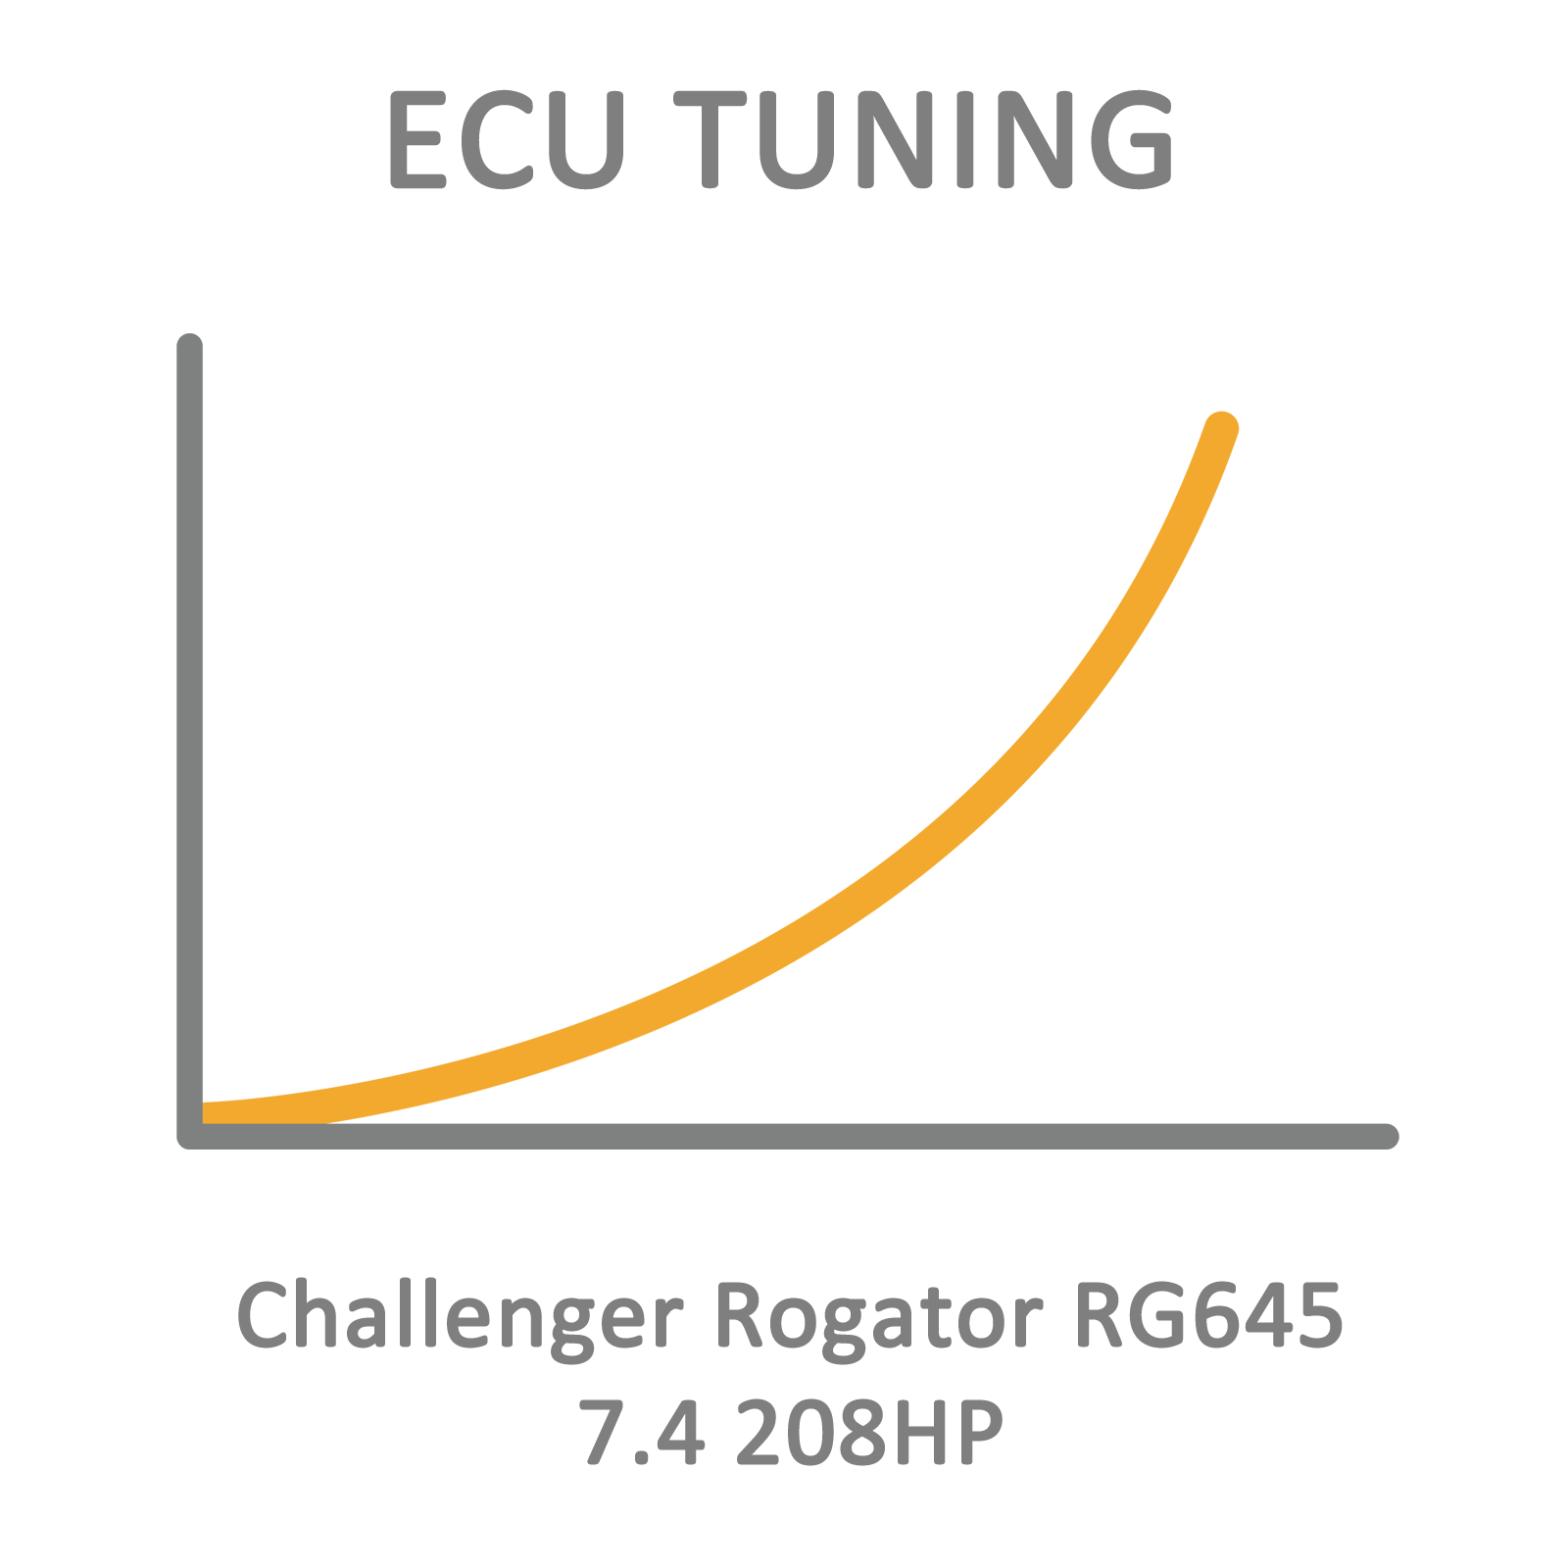 Challenger Rogator RG645 7.4 208HP ECU Tuning Remapping